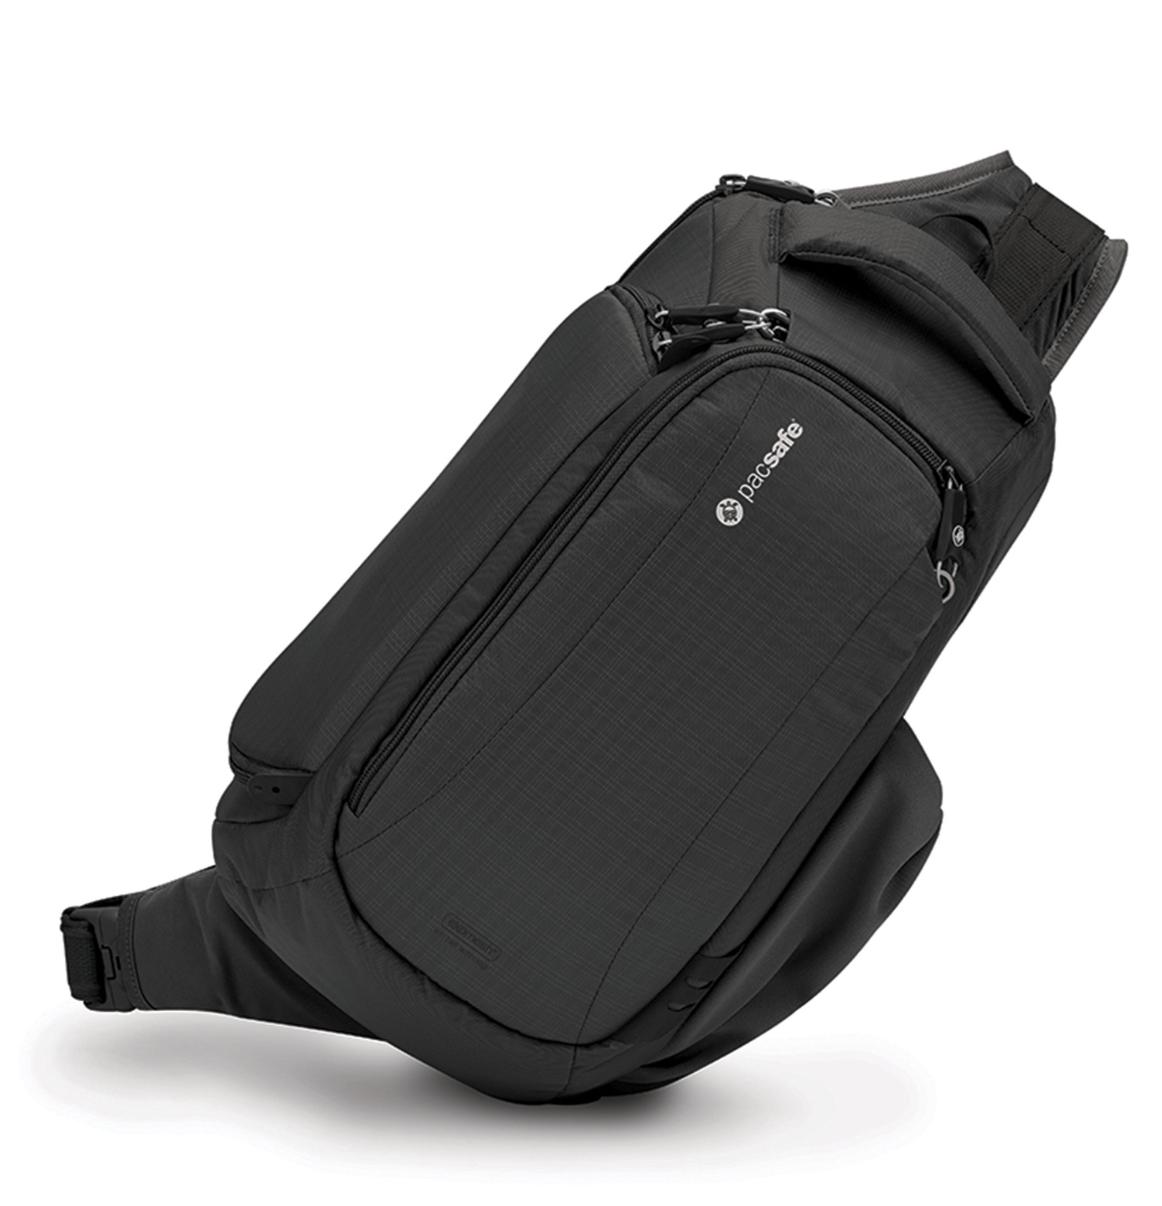 Pacsafe Camsafe V9 Anti-Theft Camera Sling Pack